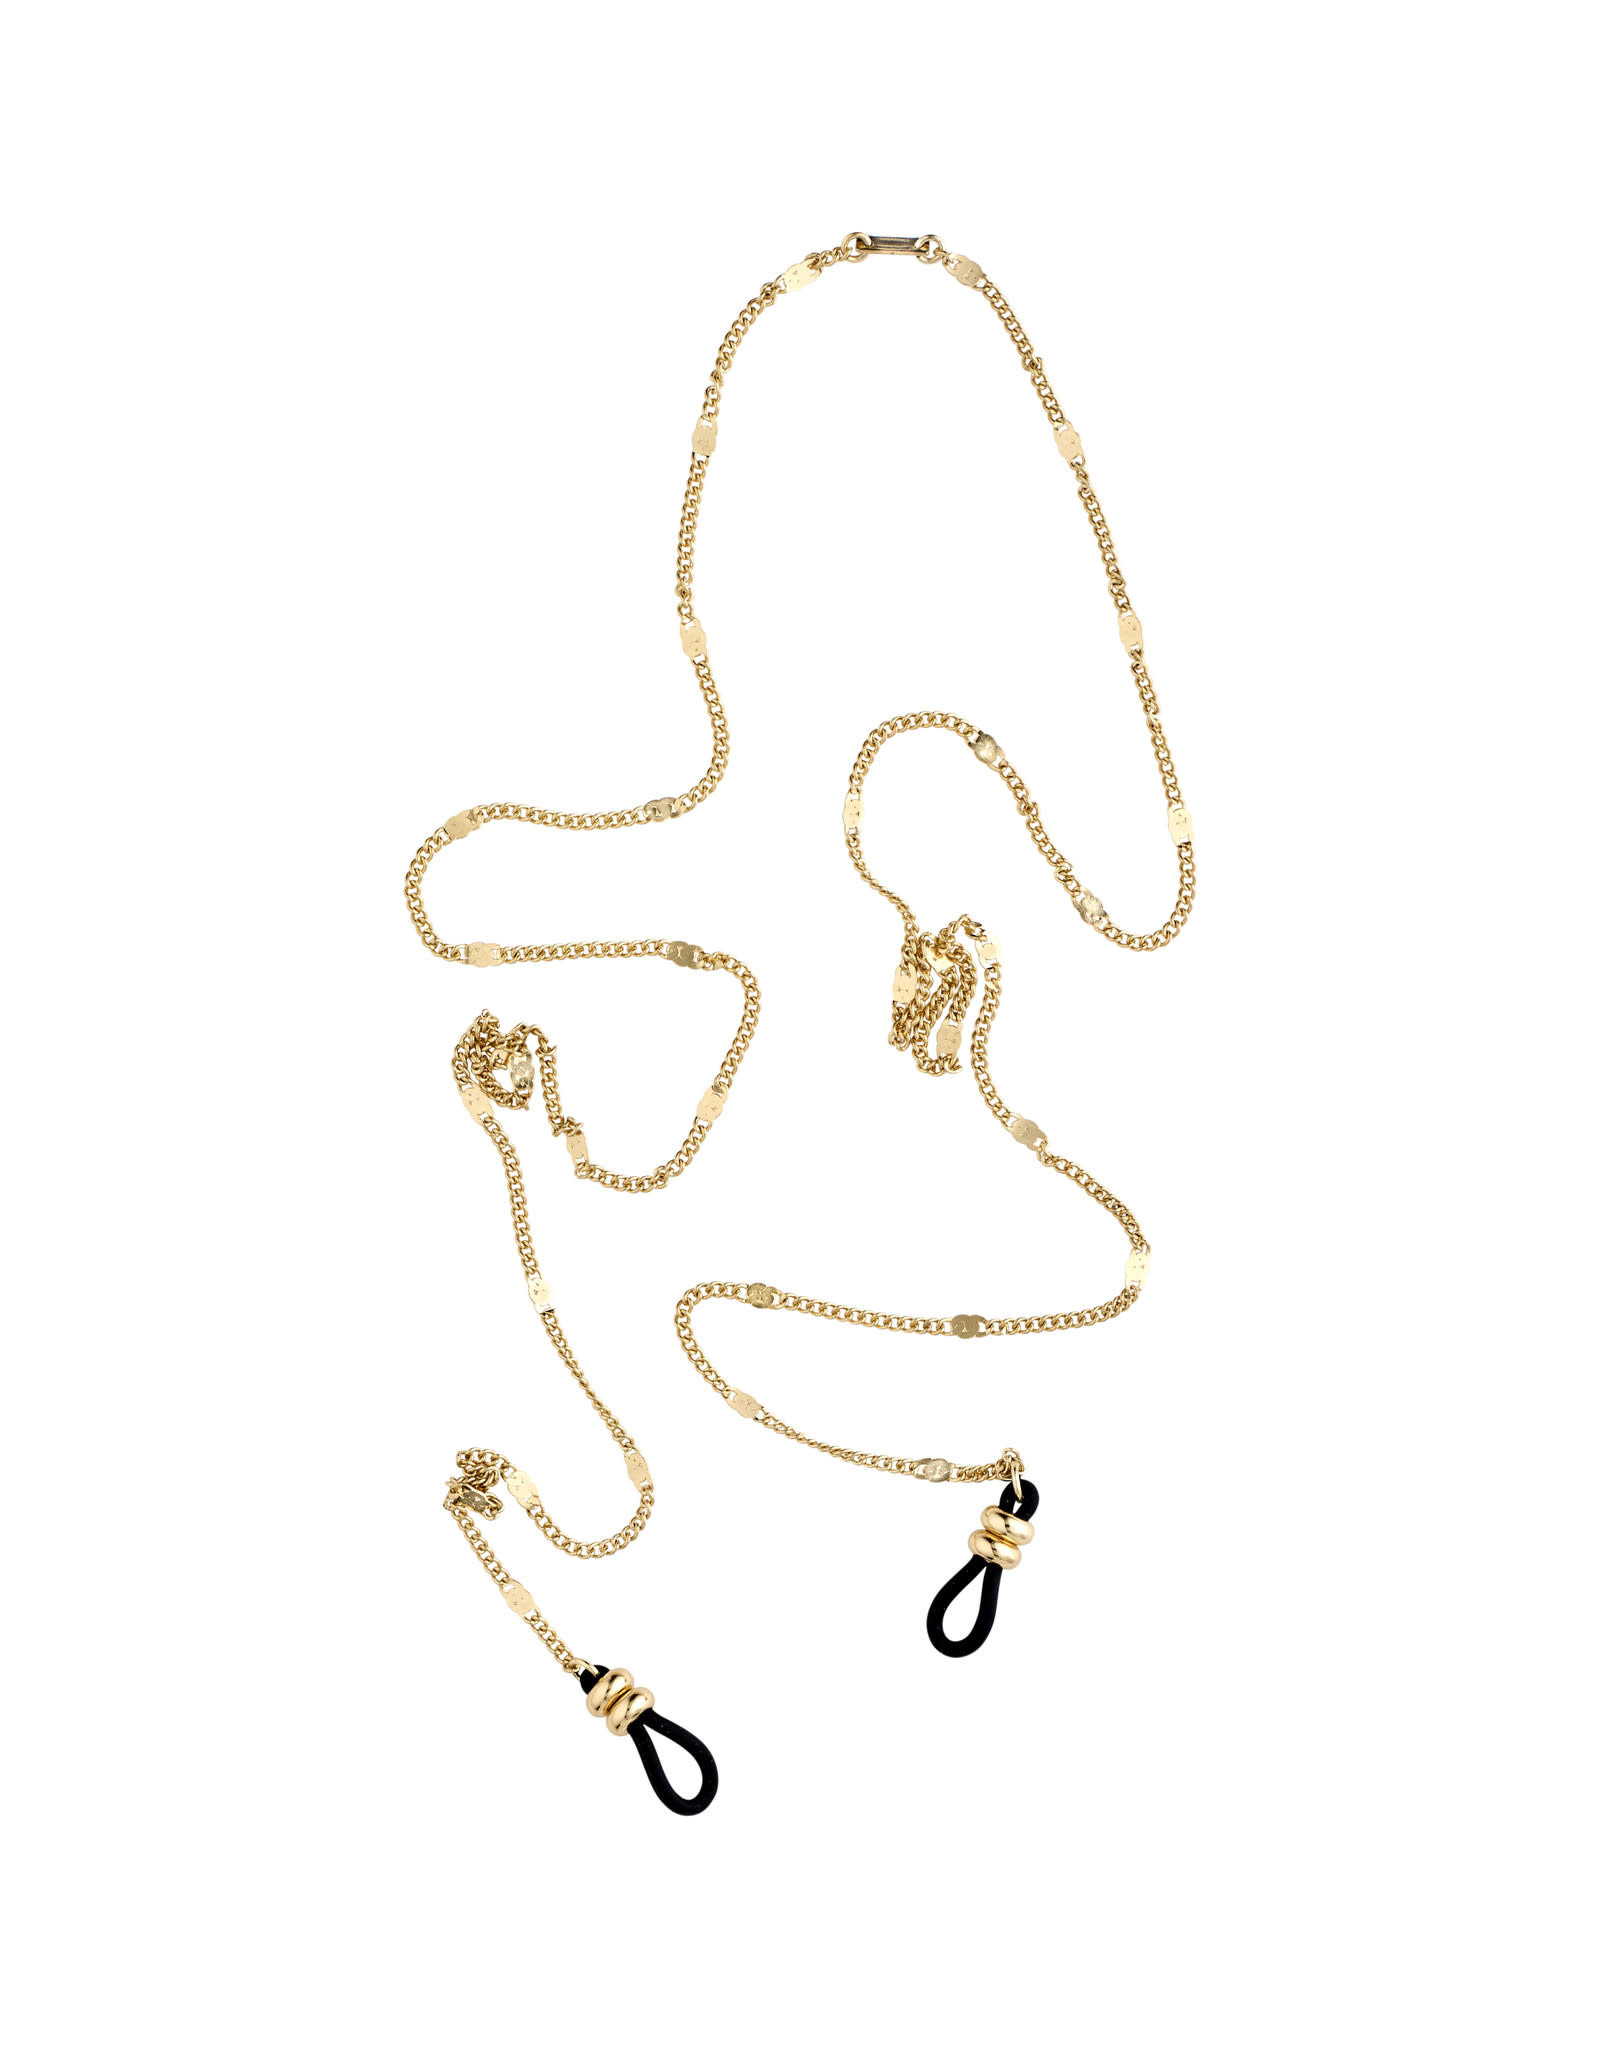 Pilgrim Sunglasses Chain (Choose your finish)